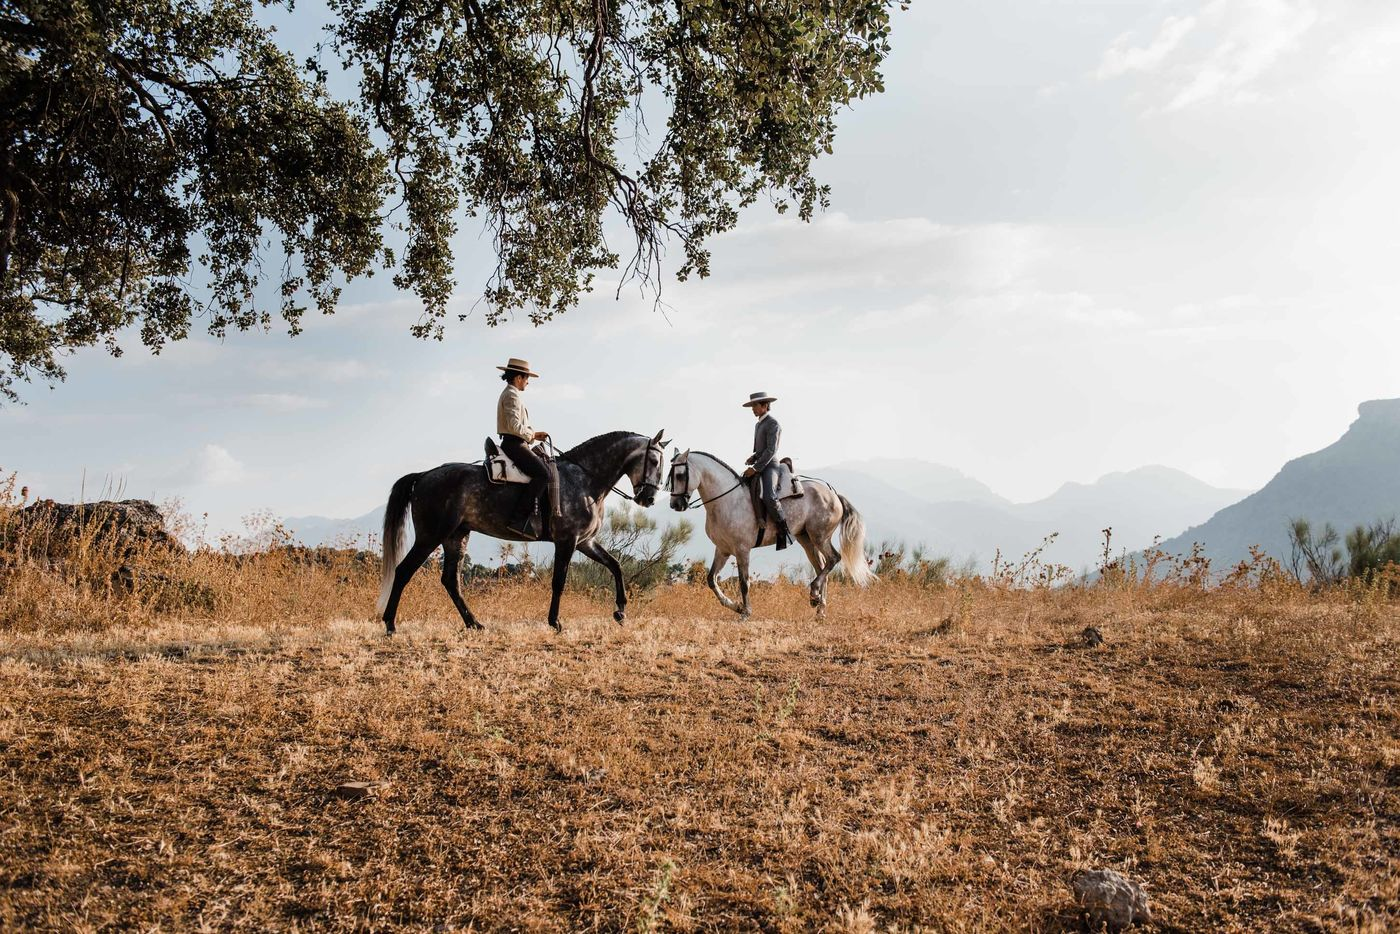 Exploring Andalucía on horseback